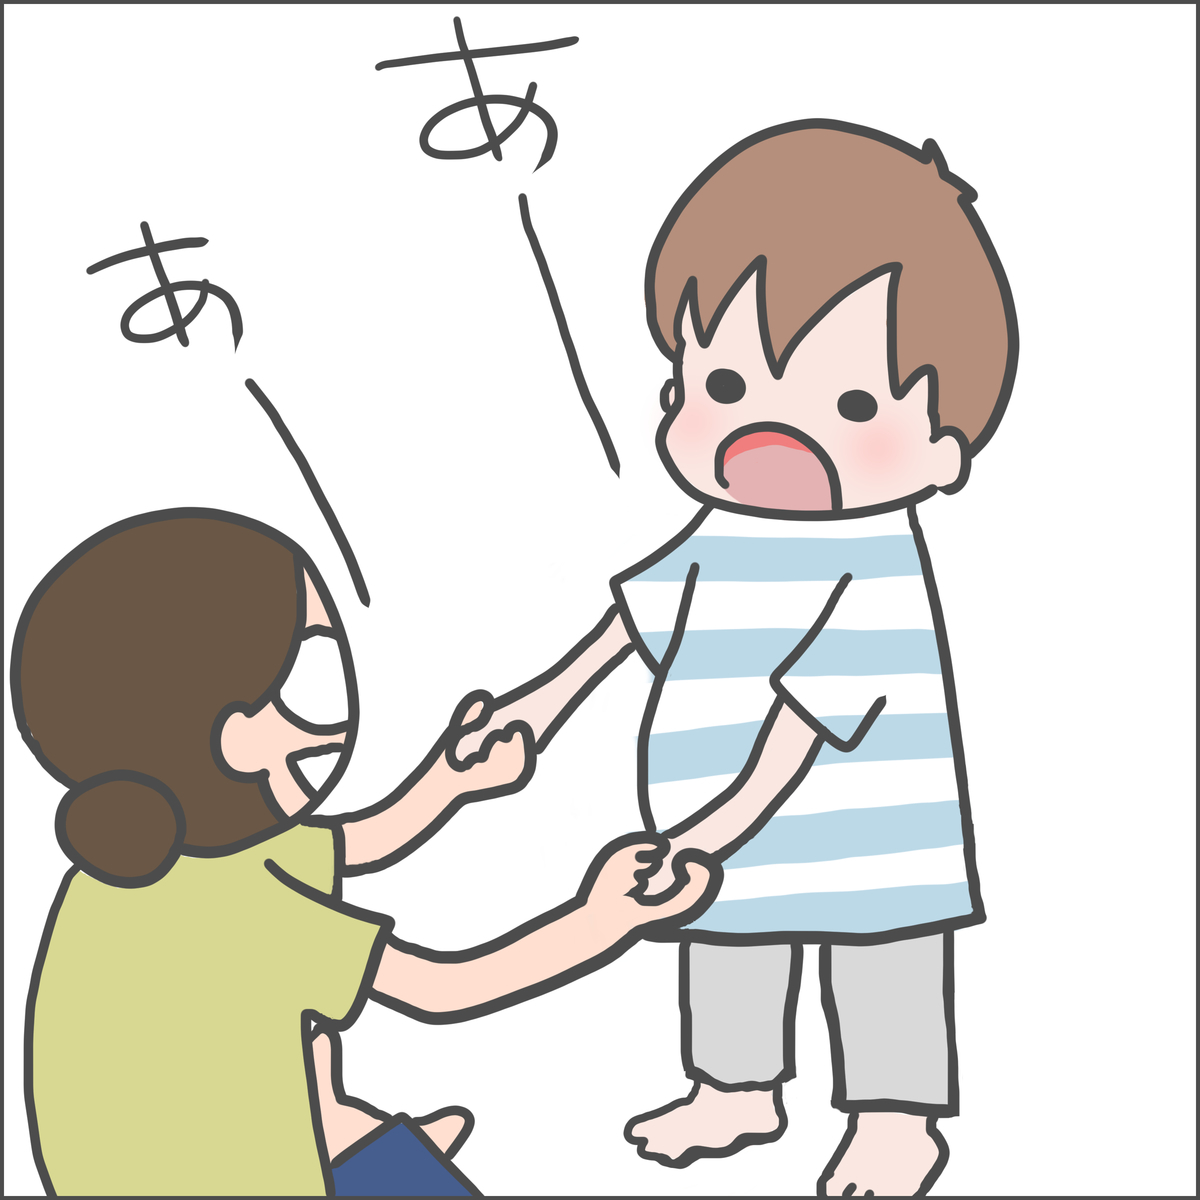 f:id:ika_yoshi:20201025221443j:plain